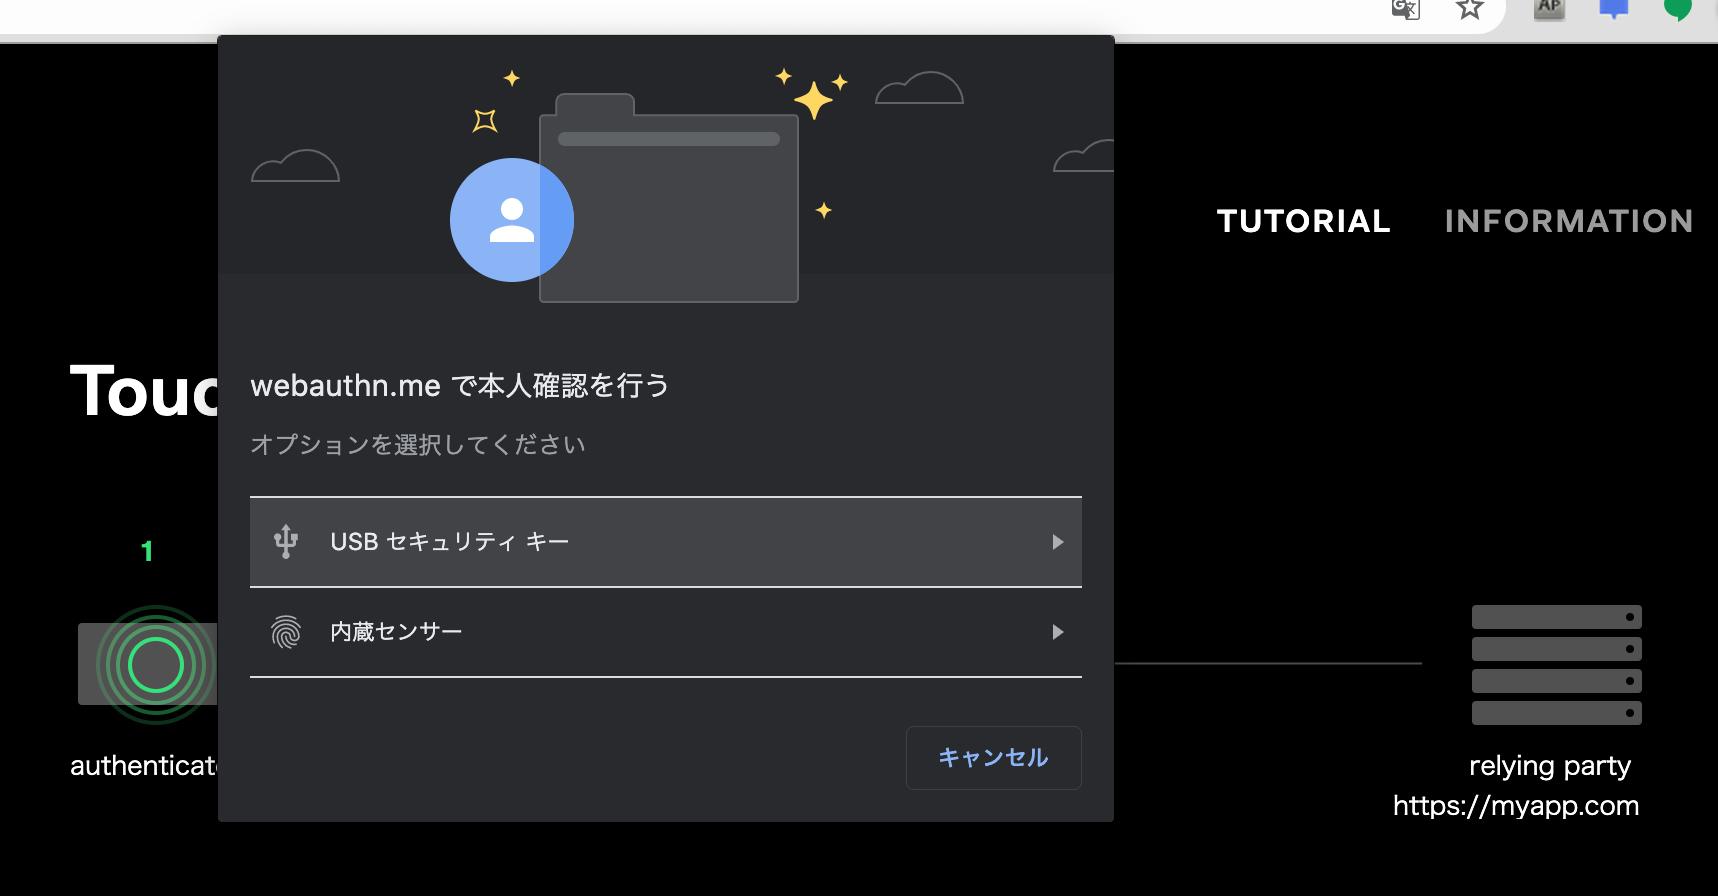 WebAuthn_Registration_1.png